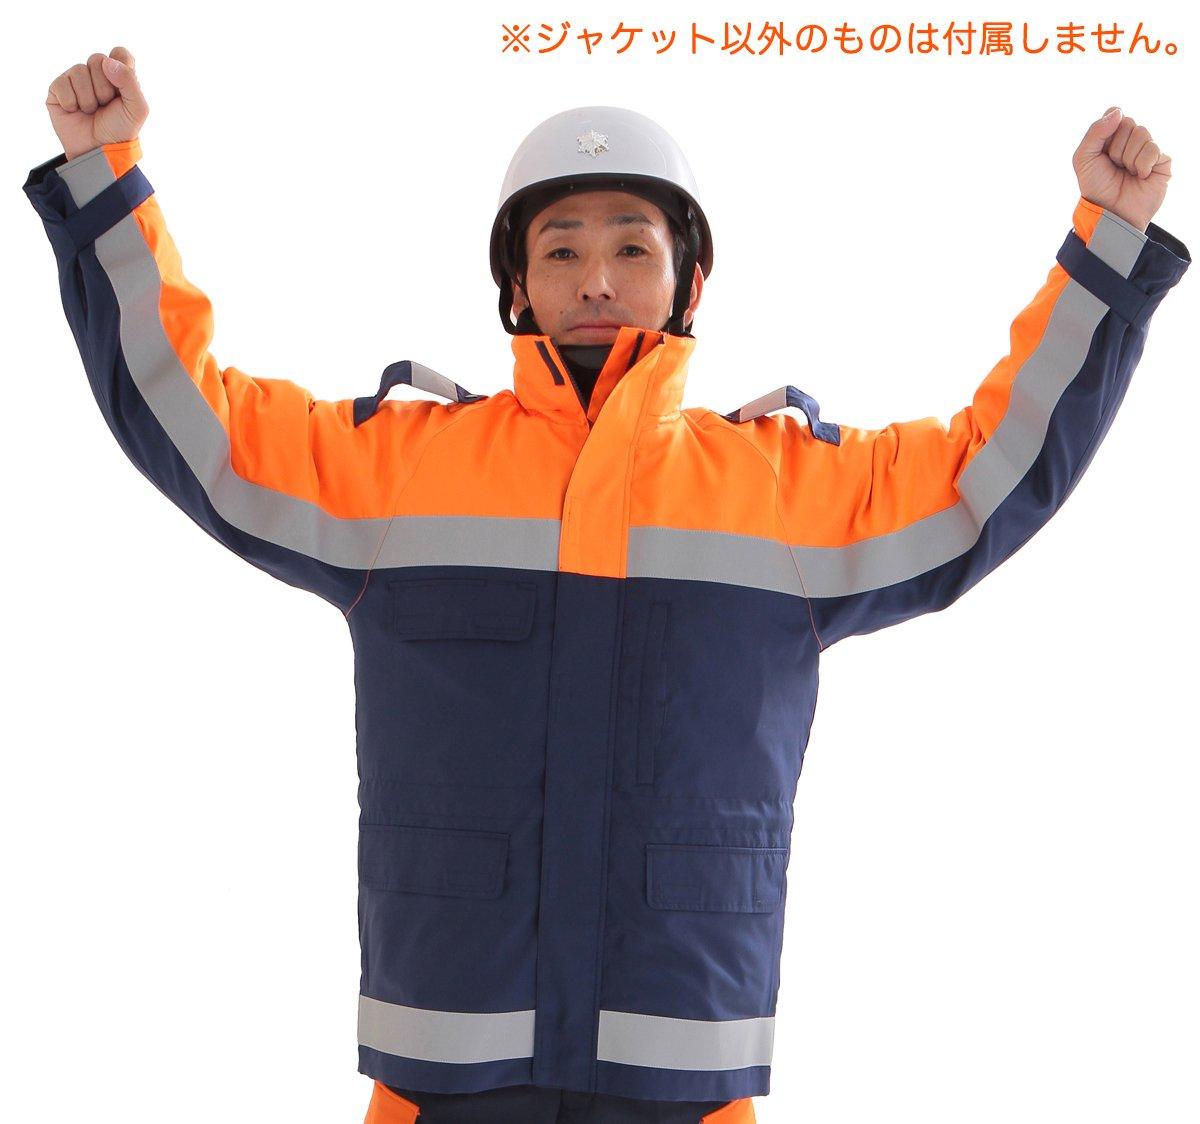 3WAY高視認消防防寒コート 消防寒【画像2】